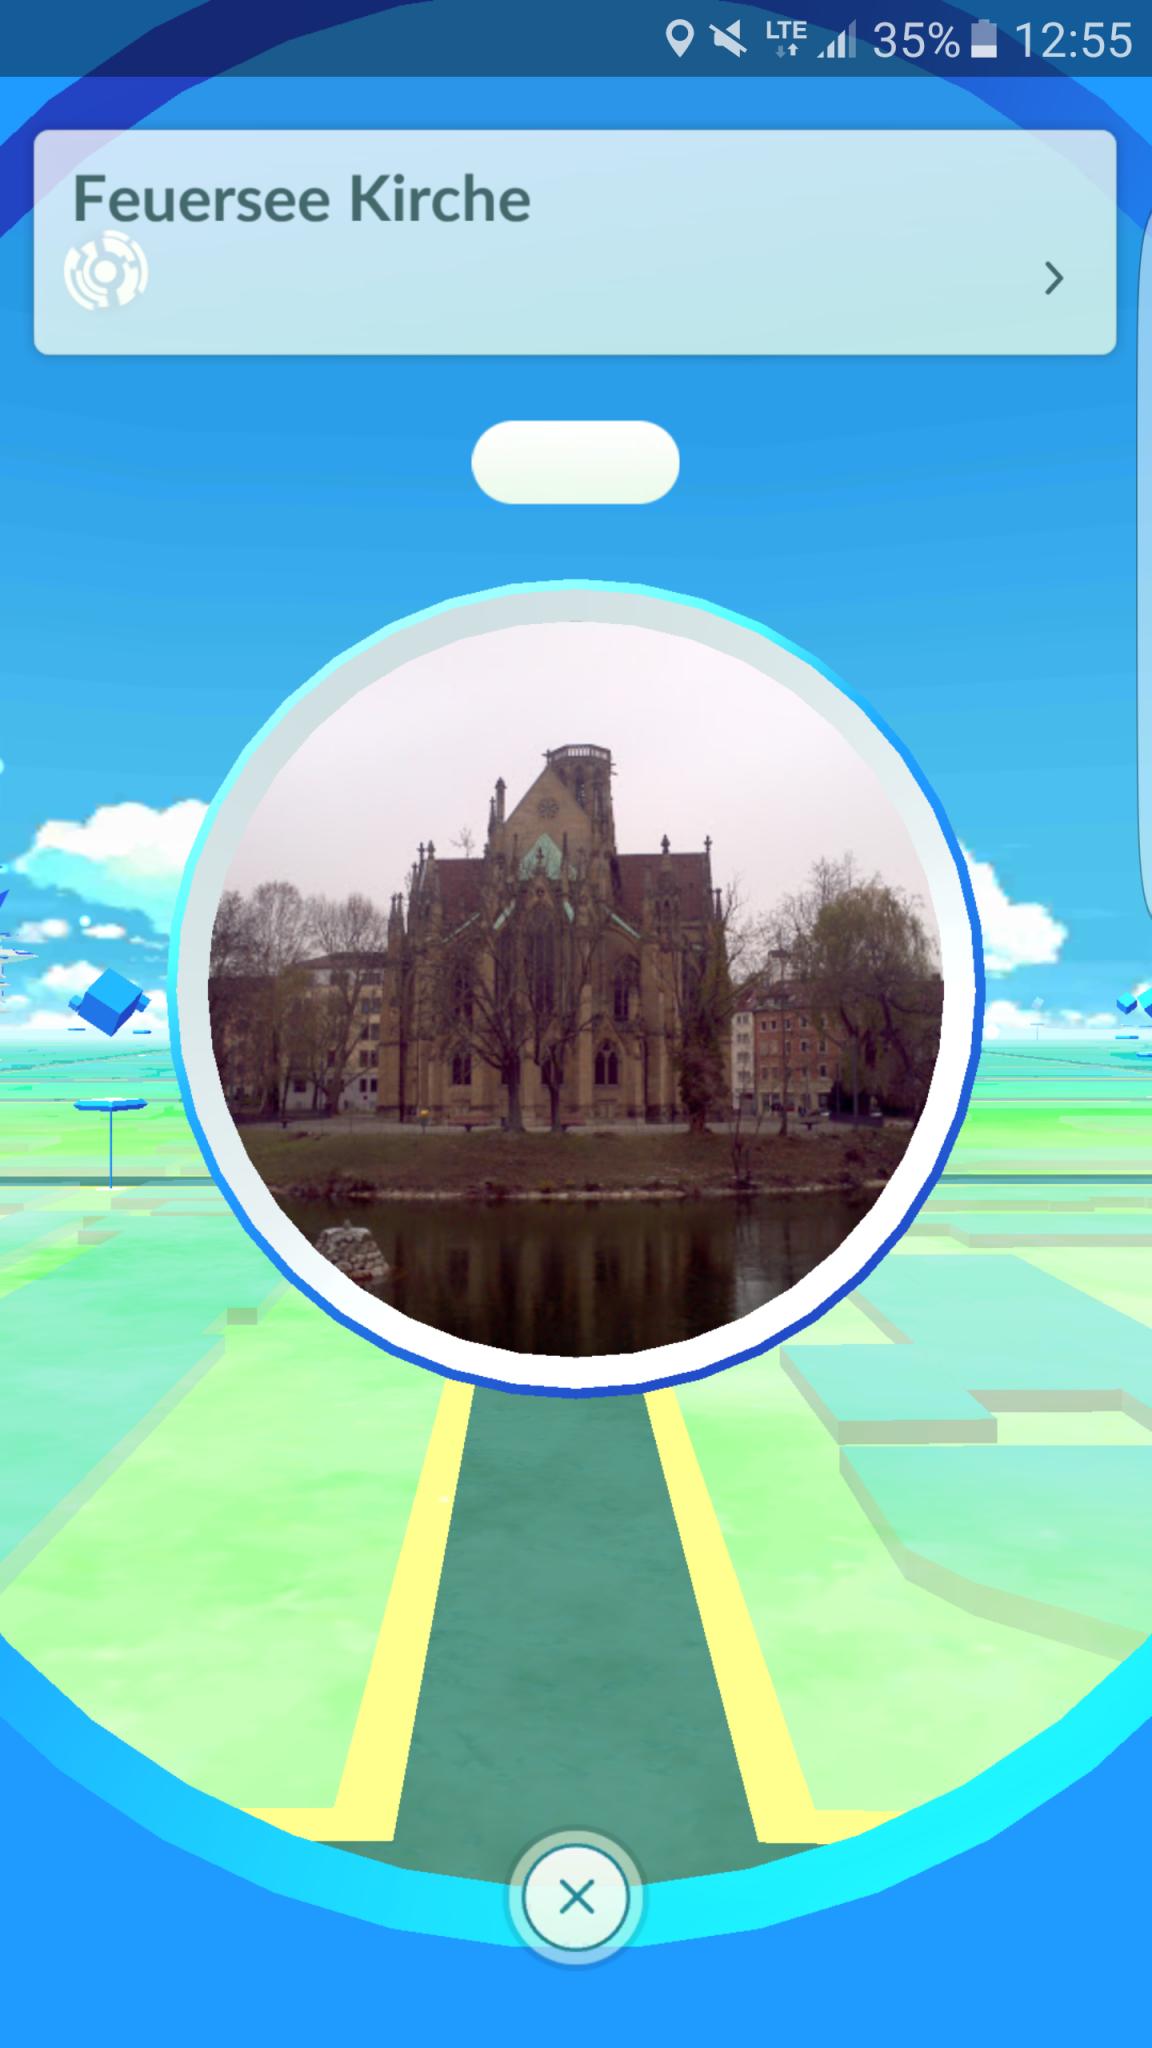 Pokémon Go: Kirchen bieten sich als markante Punkte besonders als Pokéstops an